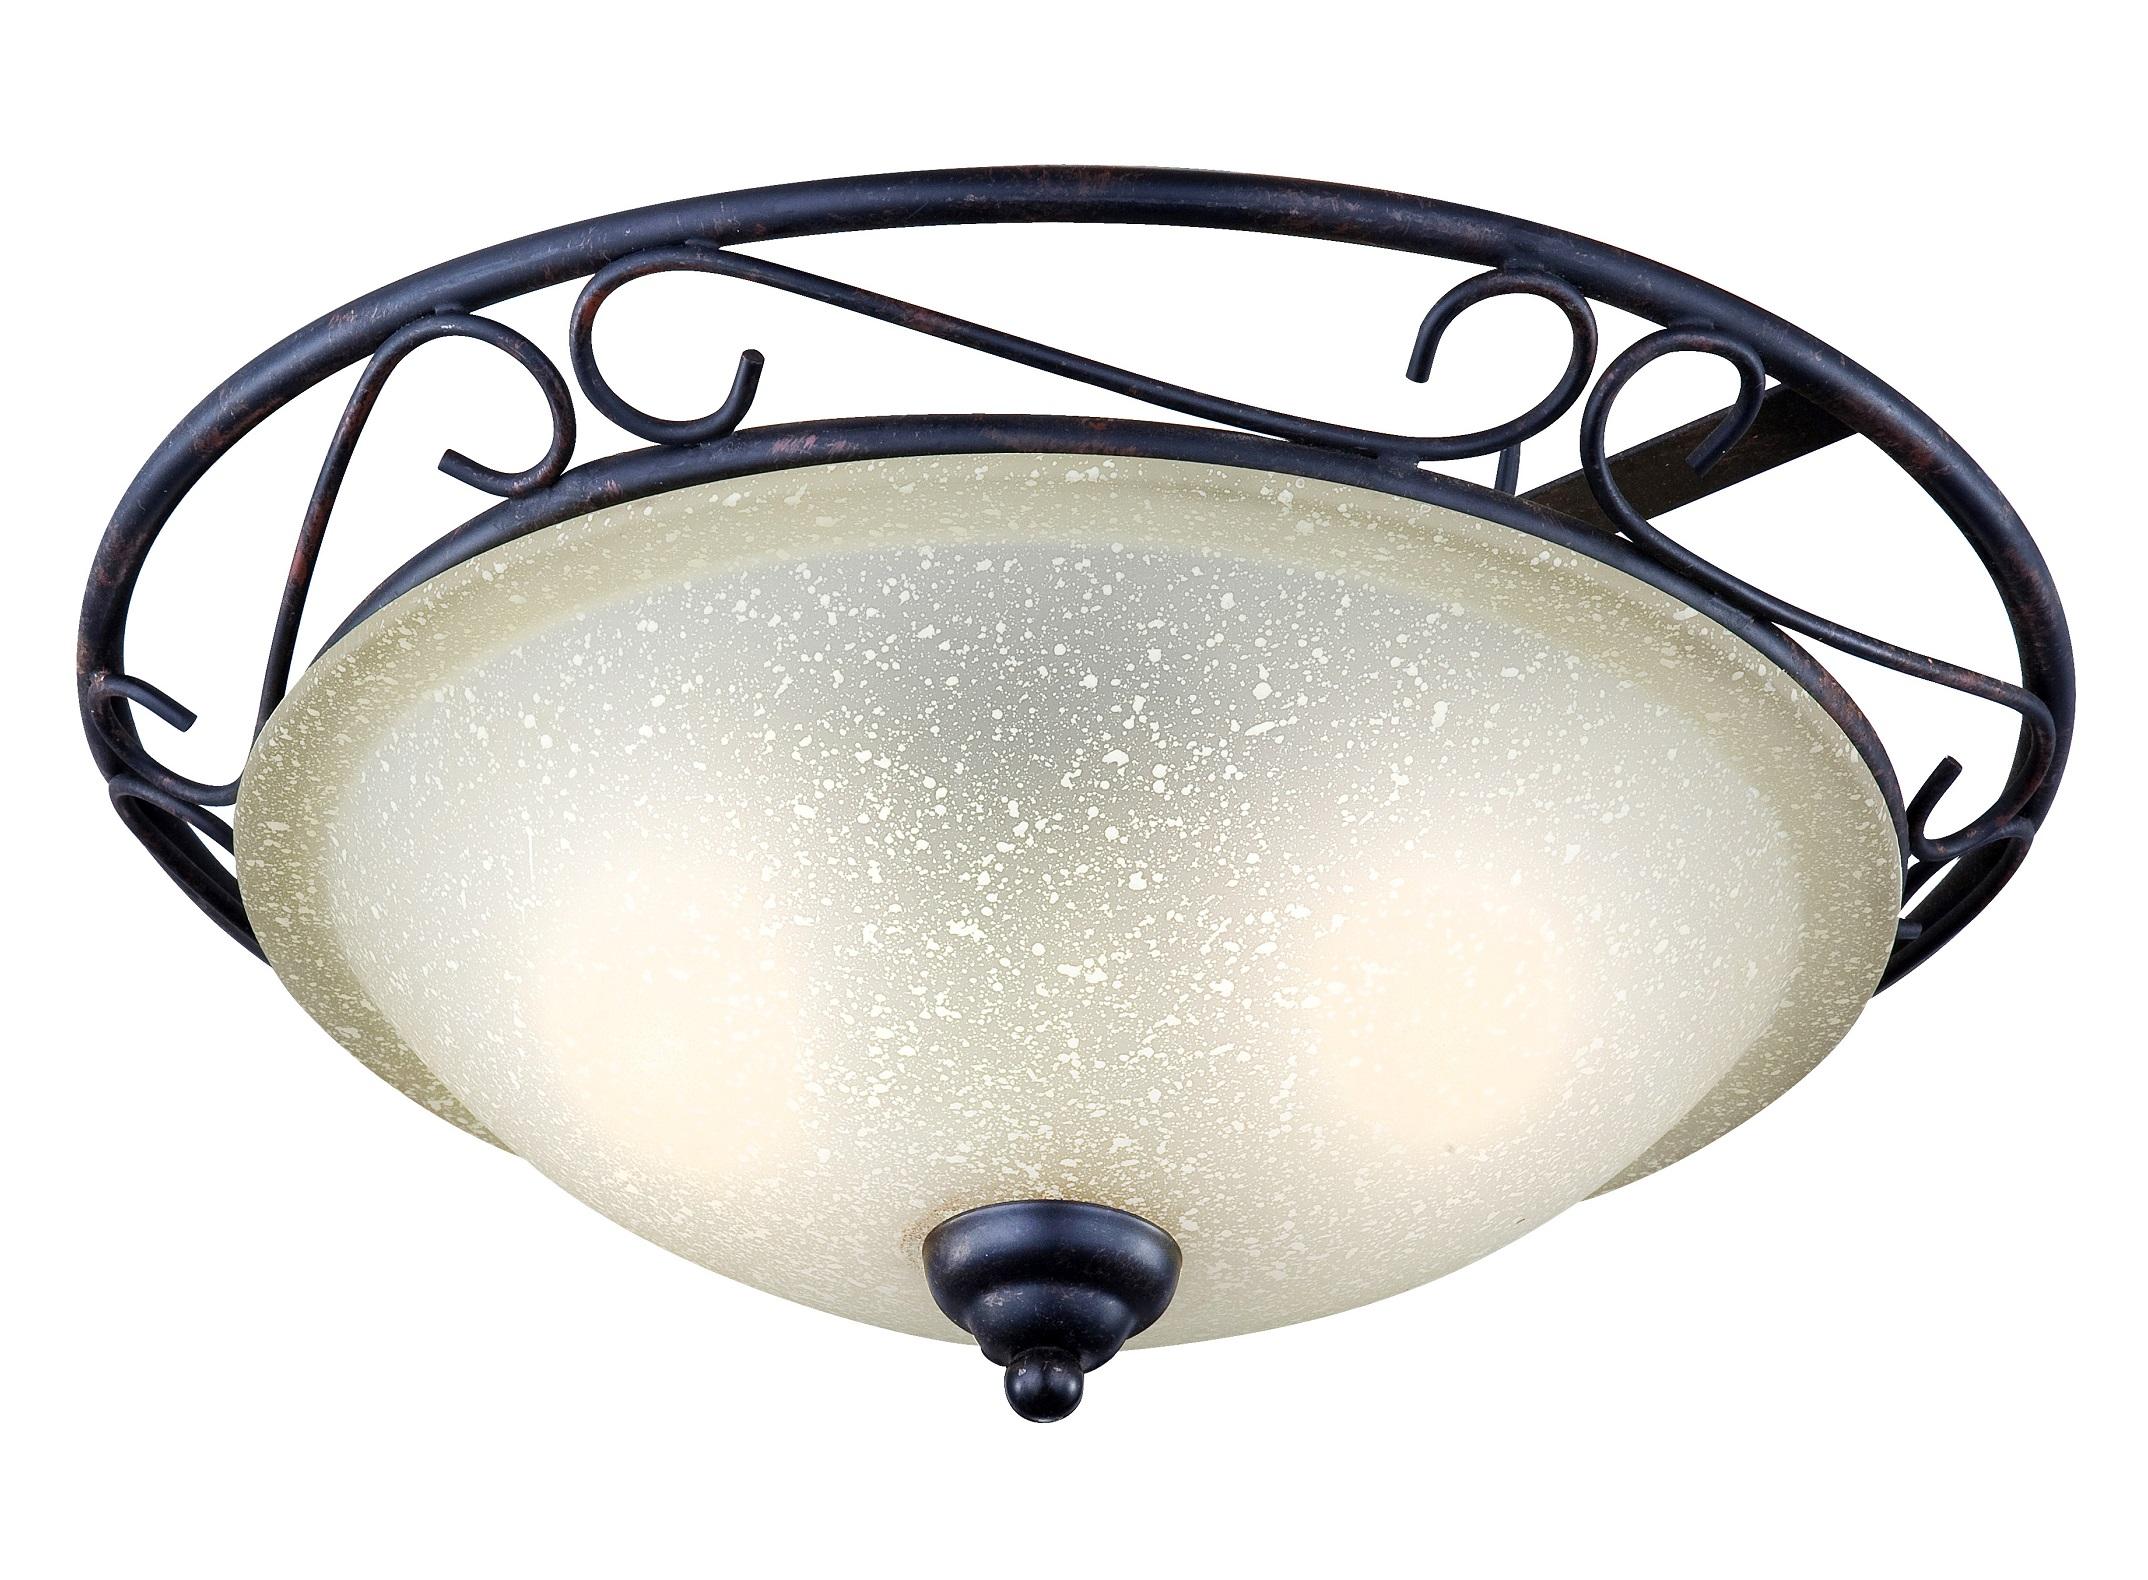 Светильник настенно-потолочныйПотолочные светильники<br>Вид цоколя: E27Мощность: &amp;nbsp;60W&amp;nbsp;Количество ламп: 2 (нет в комплекте)<br><br>kit: None<br>gender: None